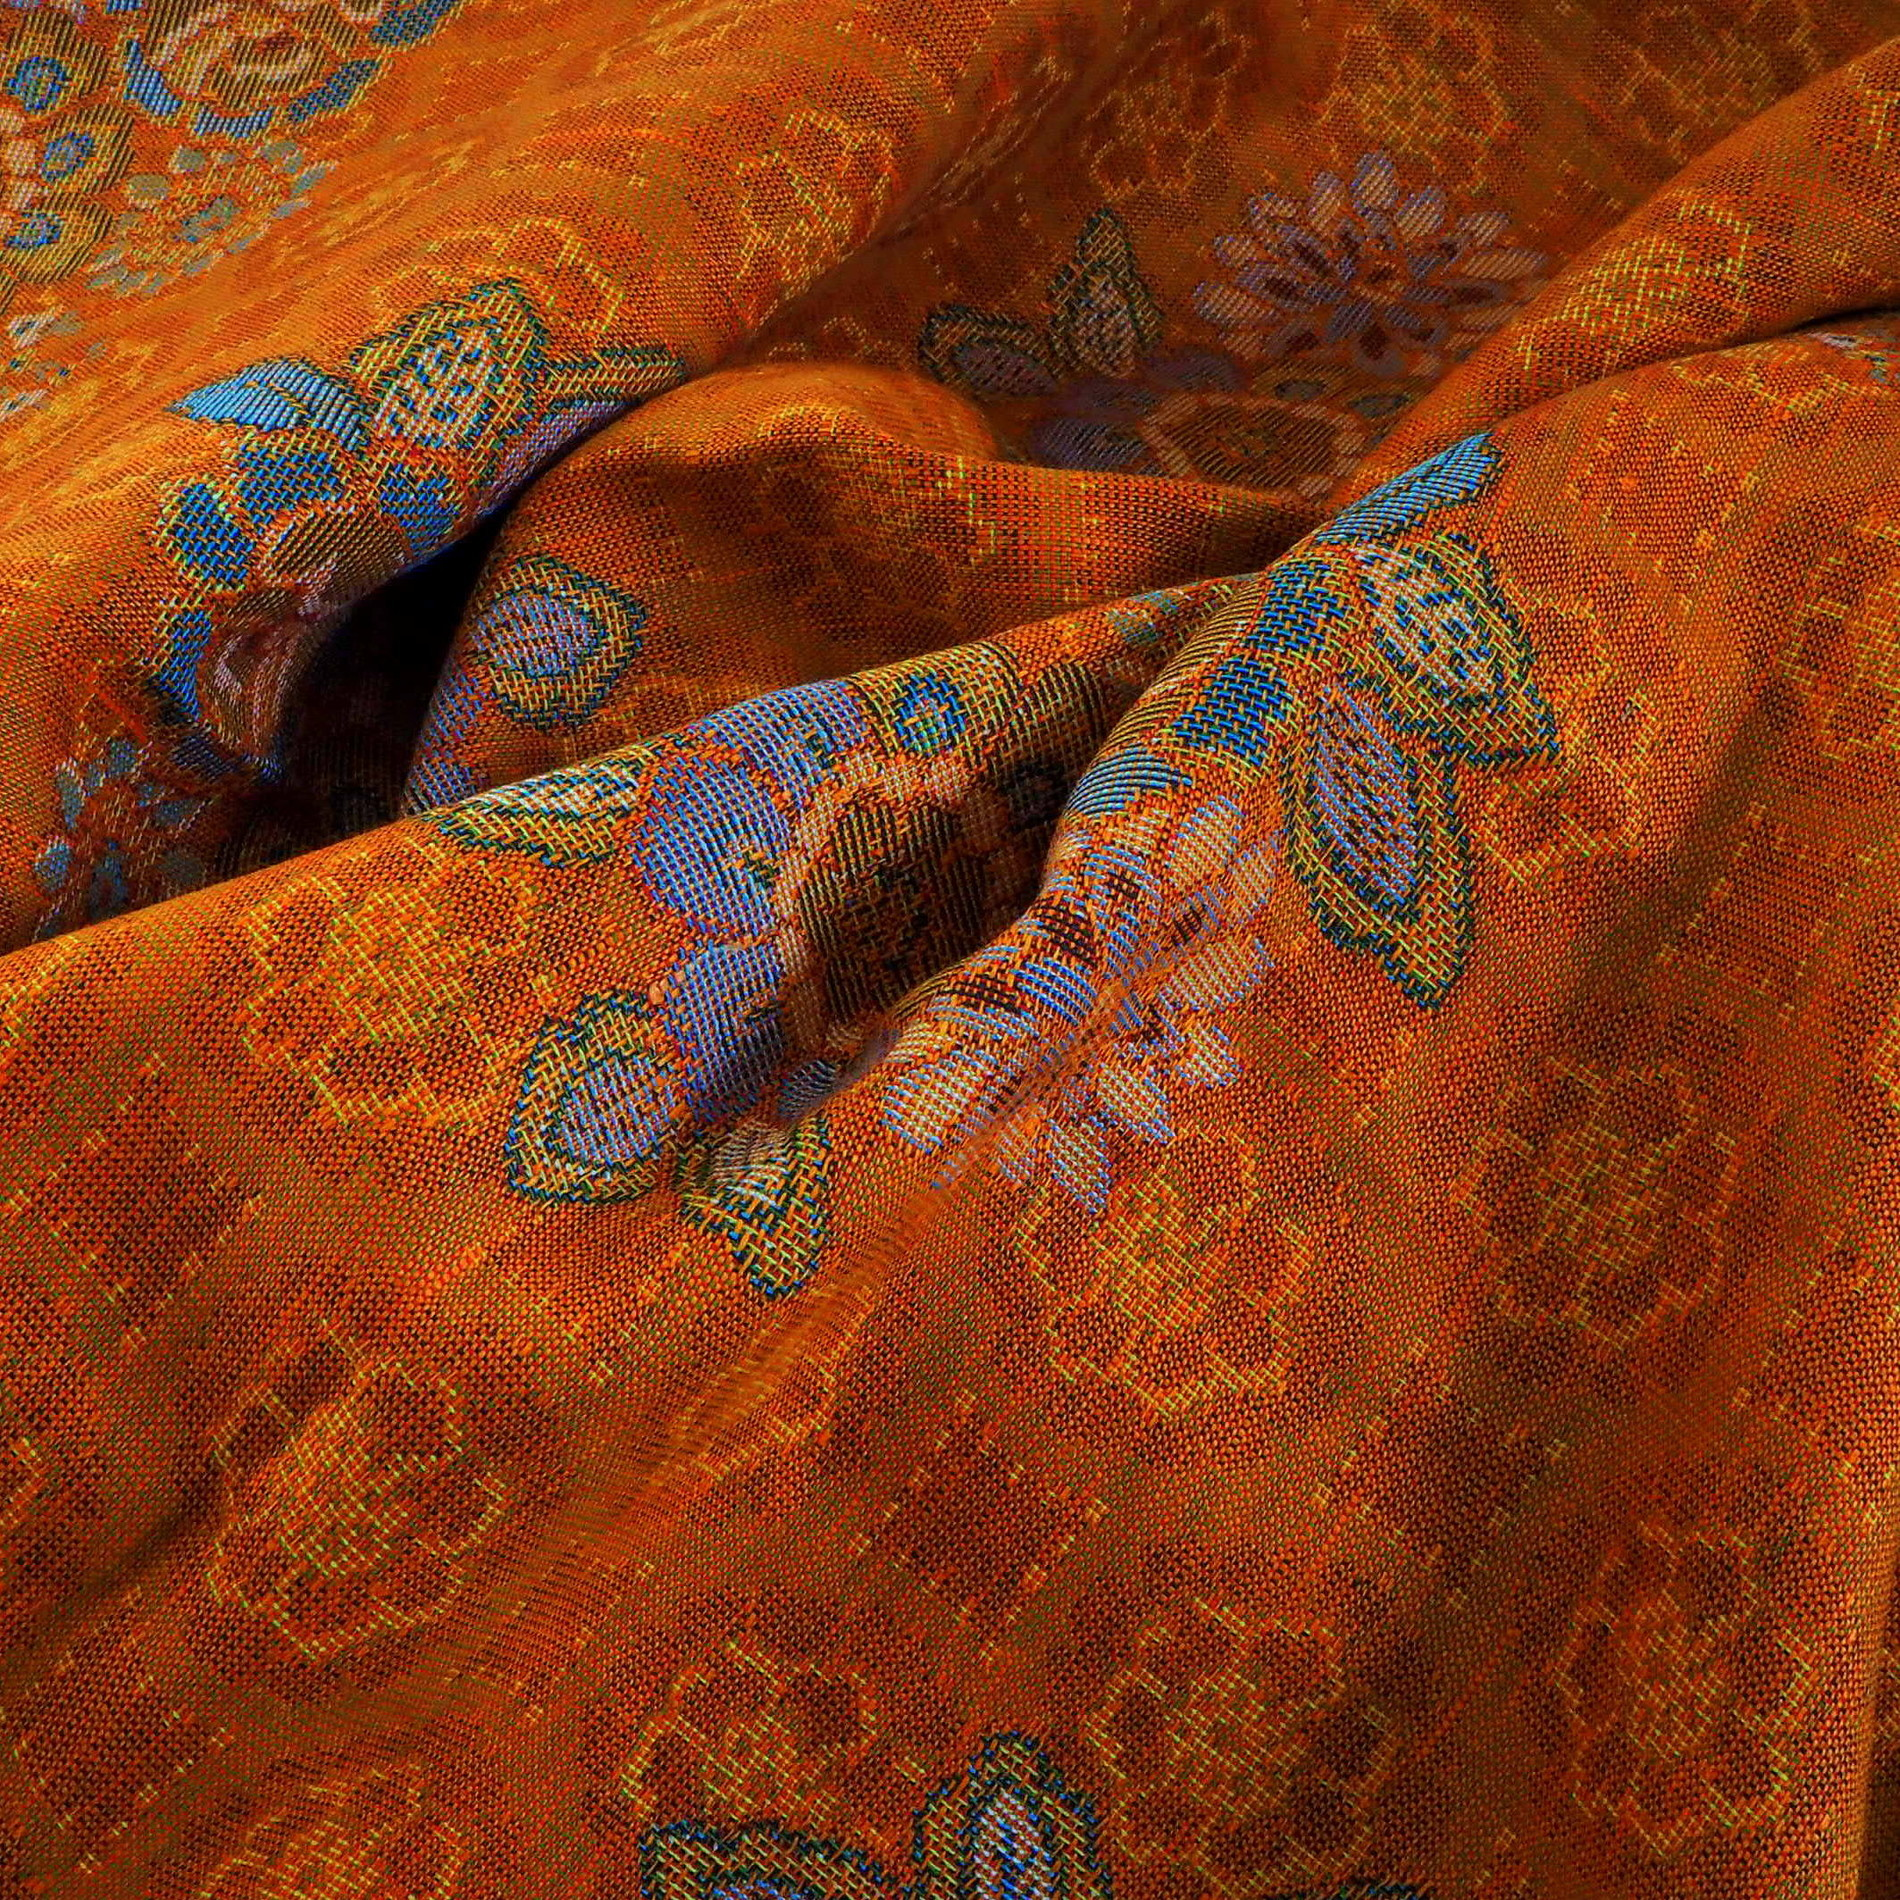 orange farbiger leinen baumwoll jacquard dekostoffe. Black Bedroom Furniture Sets. Home Design Ideas